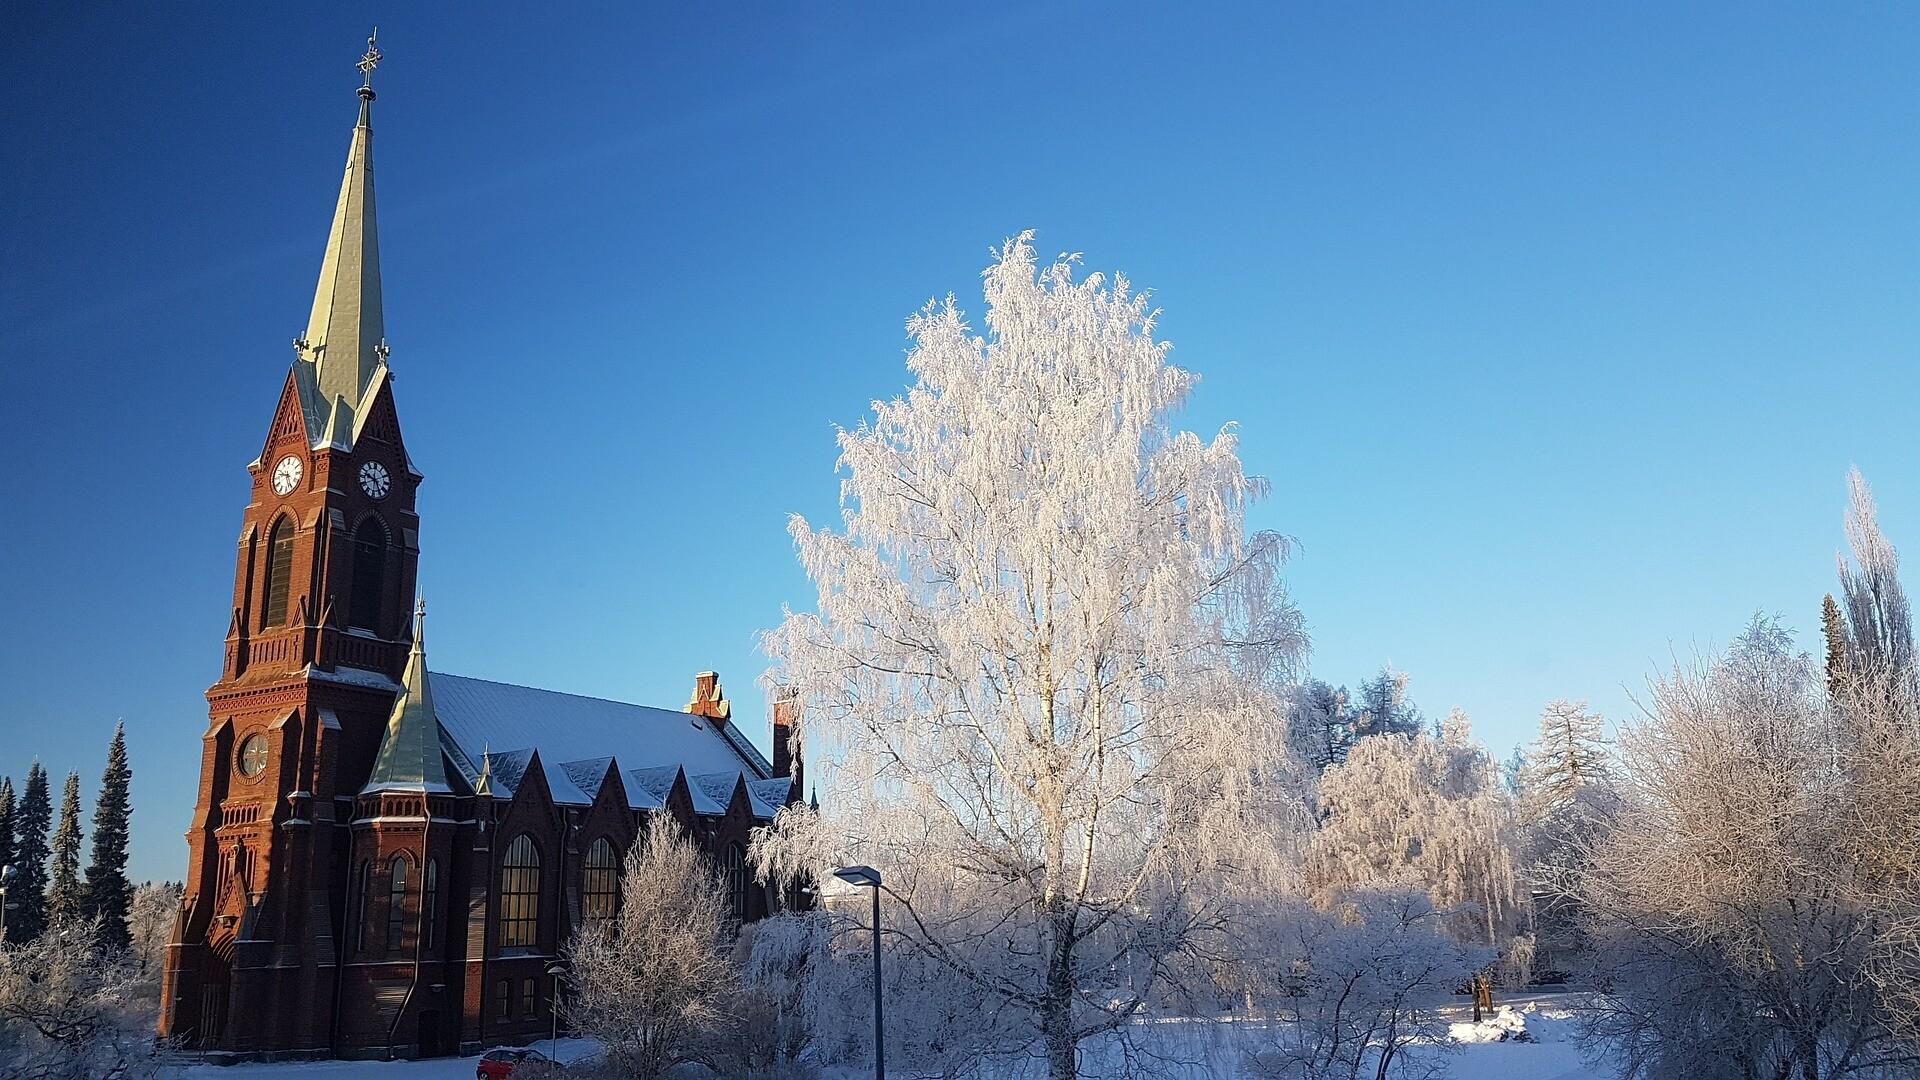 Experiencia Erasmus en Mikkeli, Finlandia, por Anna